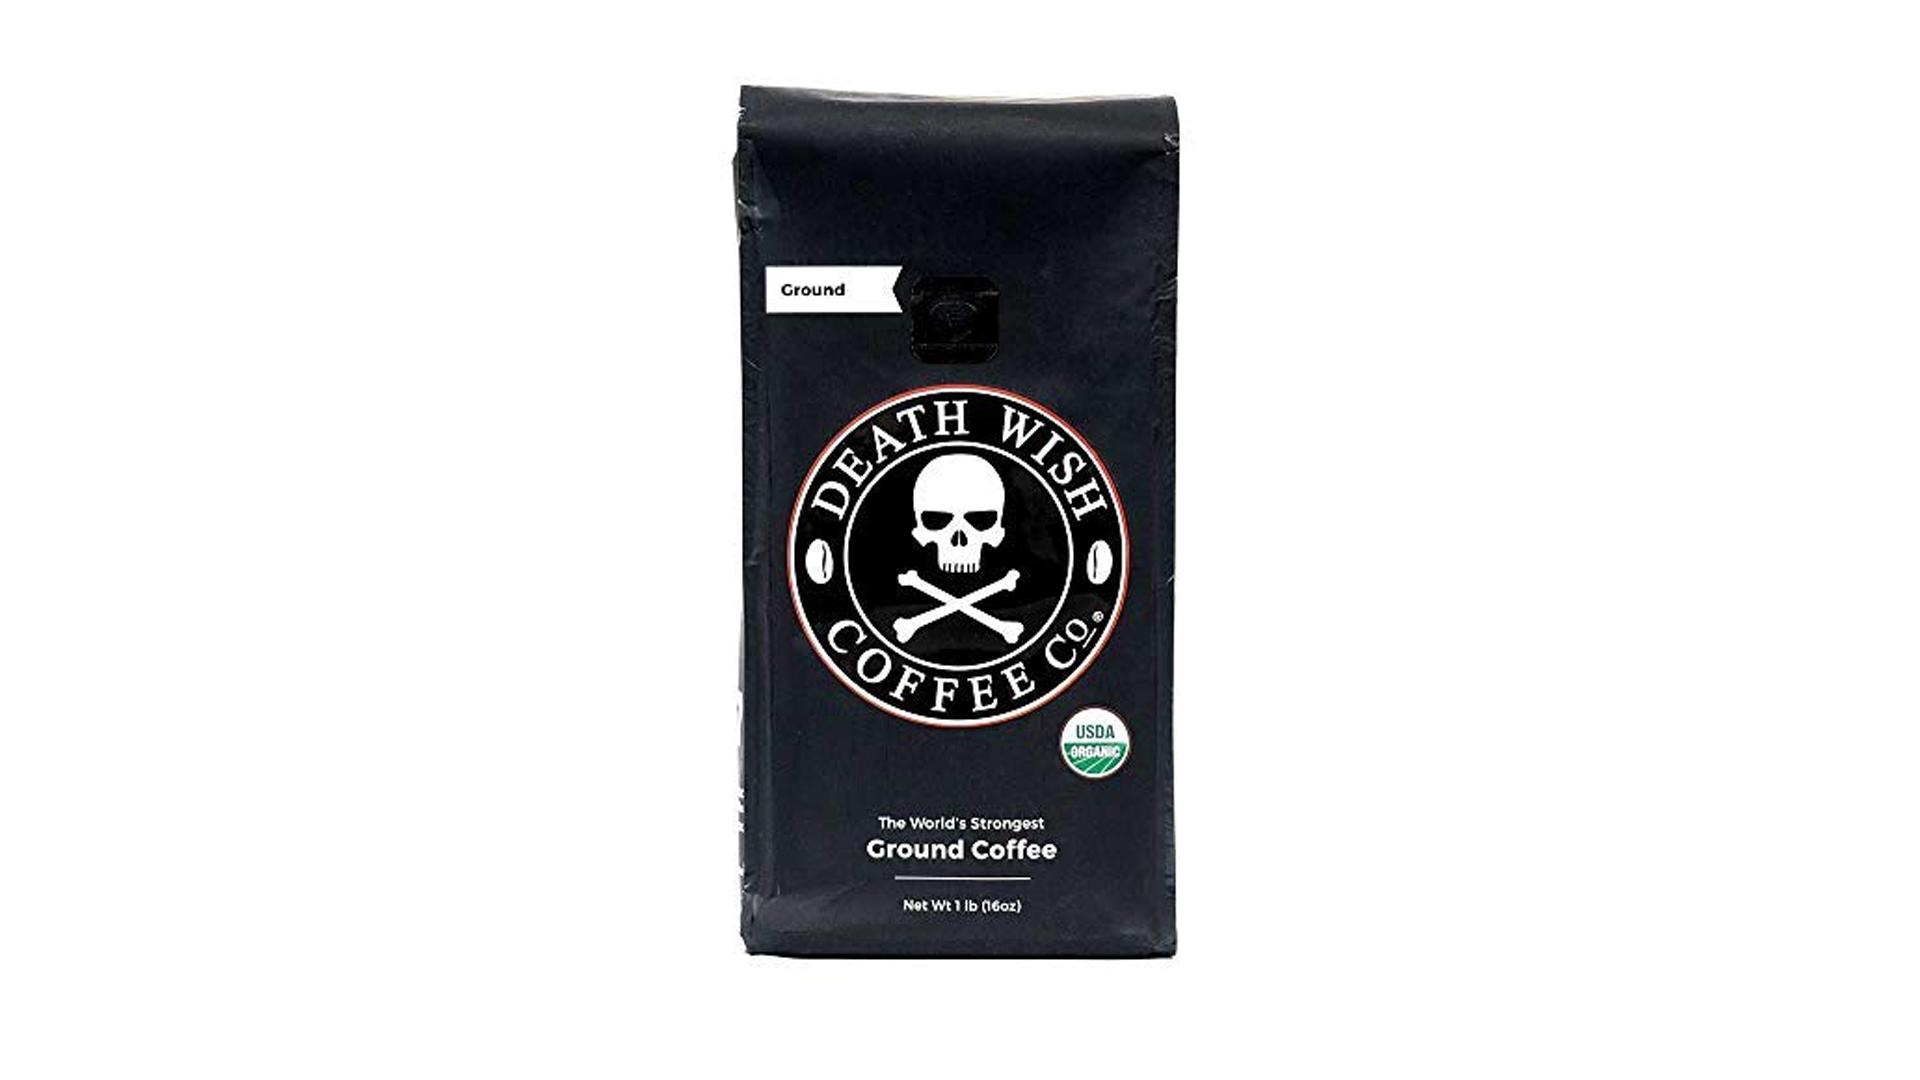 The Death Wish coffee.